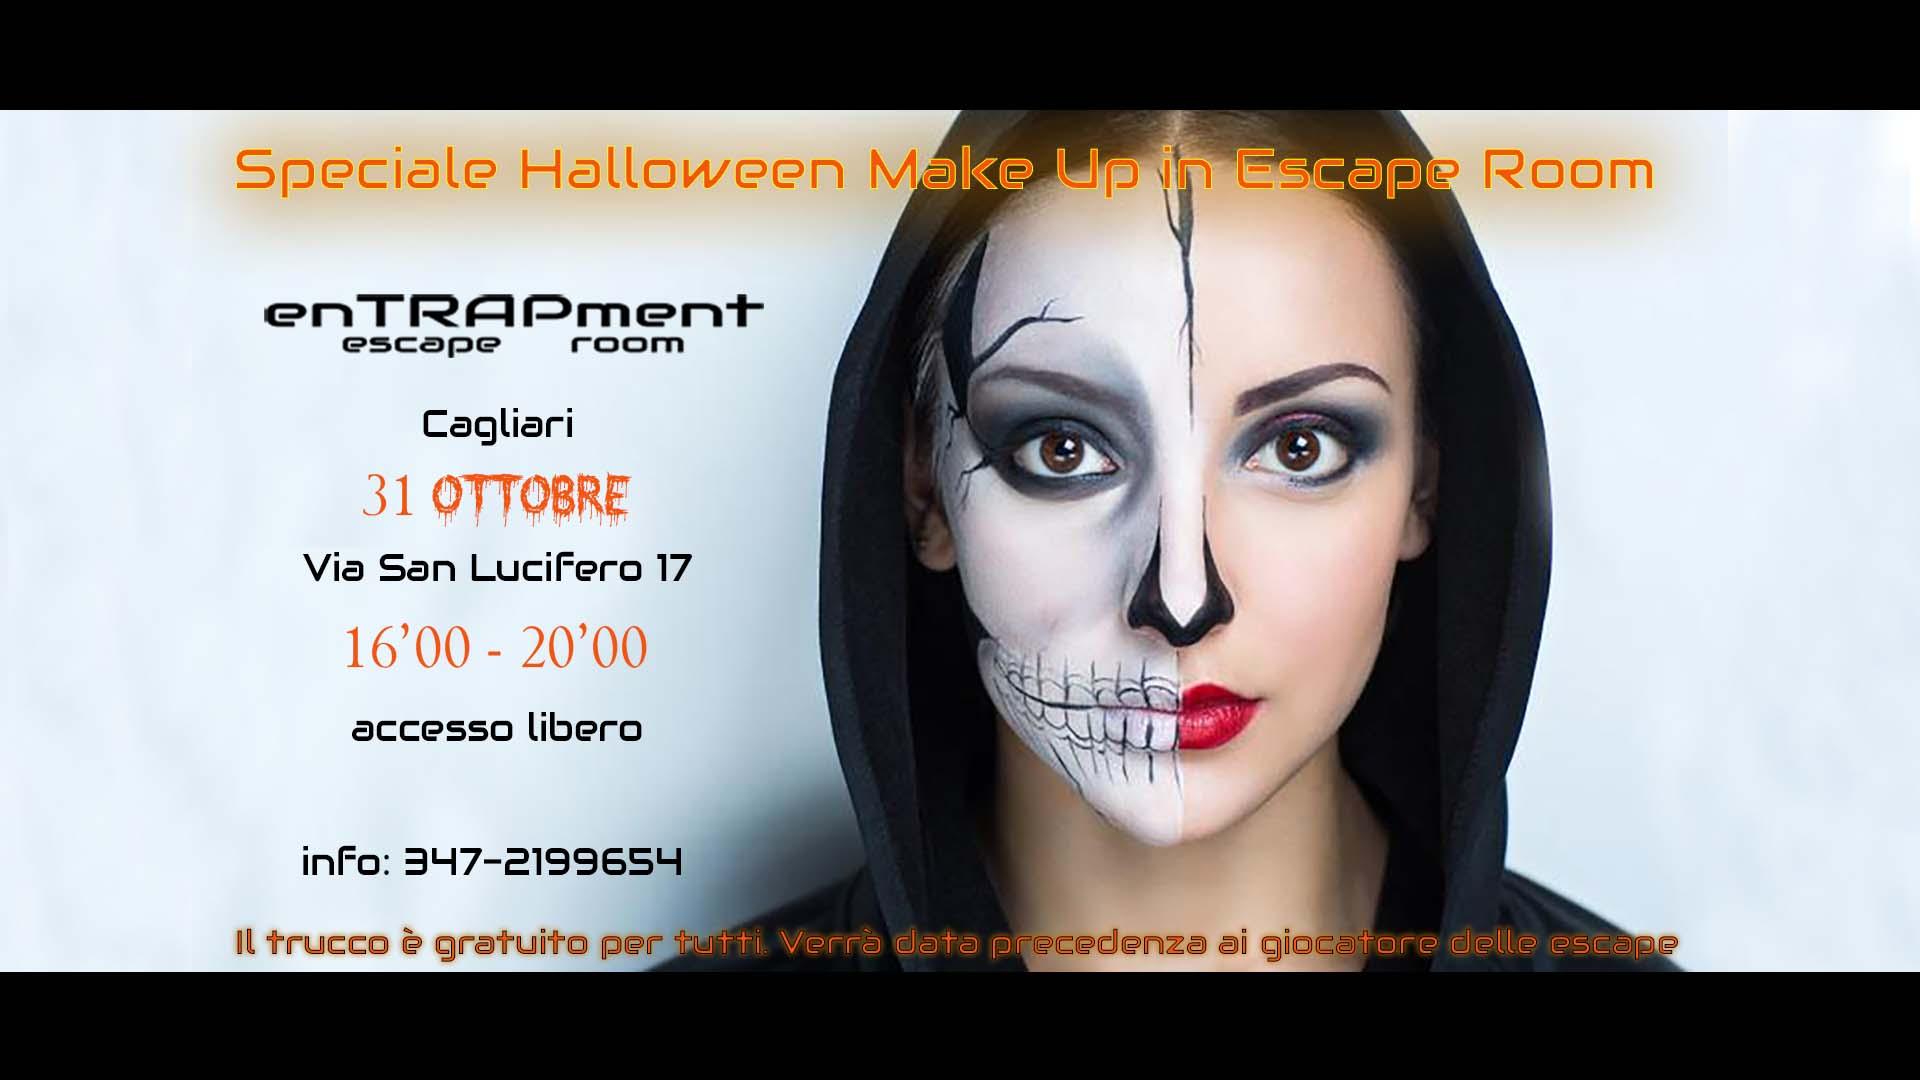 Halloween Party, Make Up horror gratutito in escape room